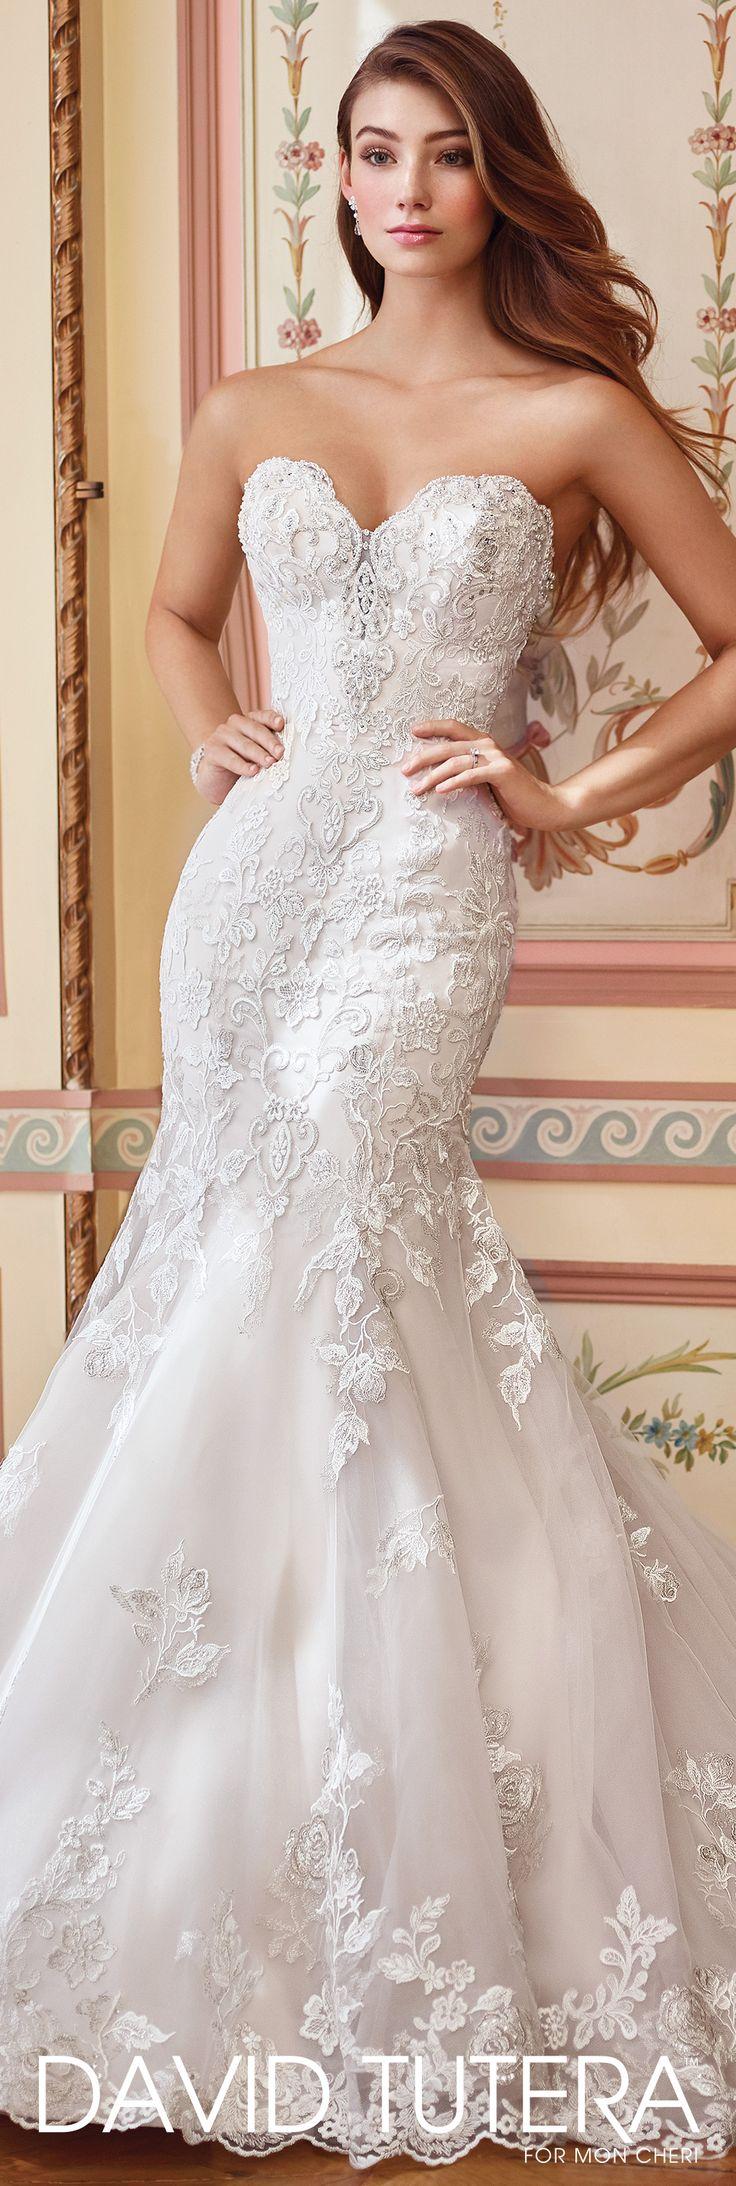 Best 25+ Drop Waist Wedding Dress Ideas On Pinterest | Princess Style Wedding  Dresses, Princess Wedding Dresses And DIY Lace Robe